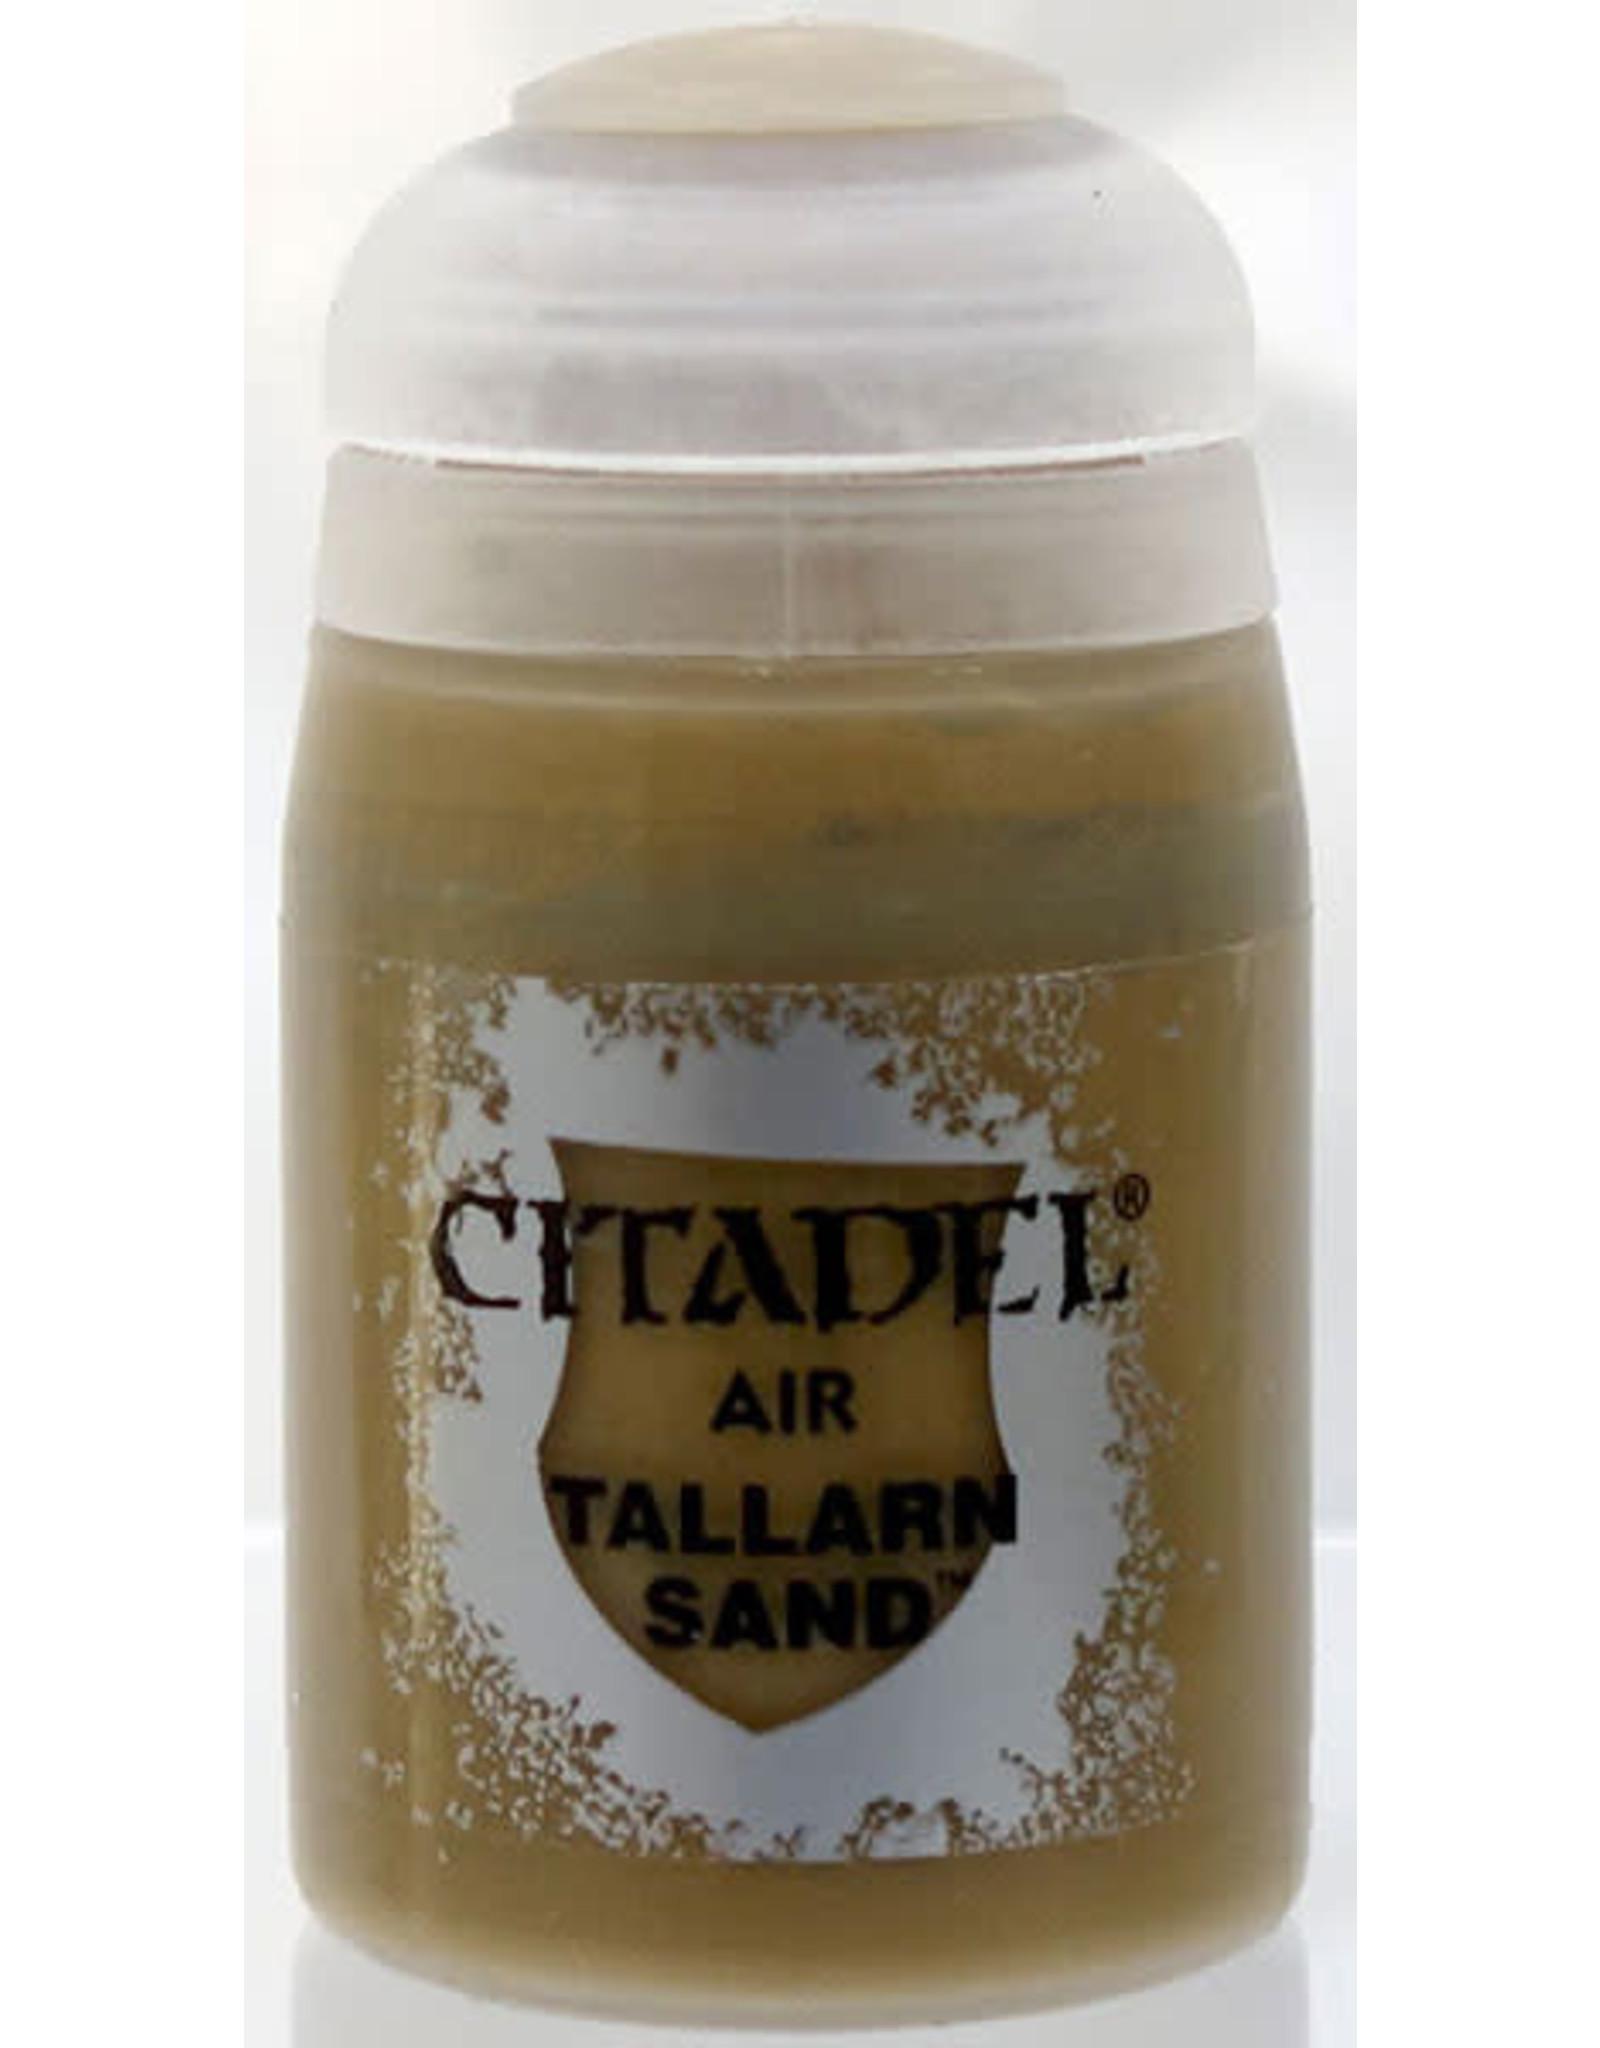 Games Workshop Citadel Paint: Tallarn Sand Air (24 ml)